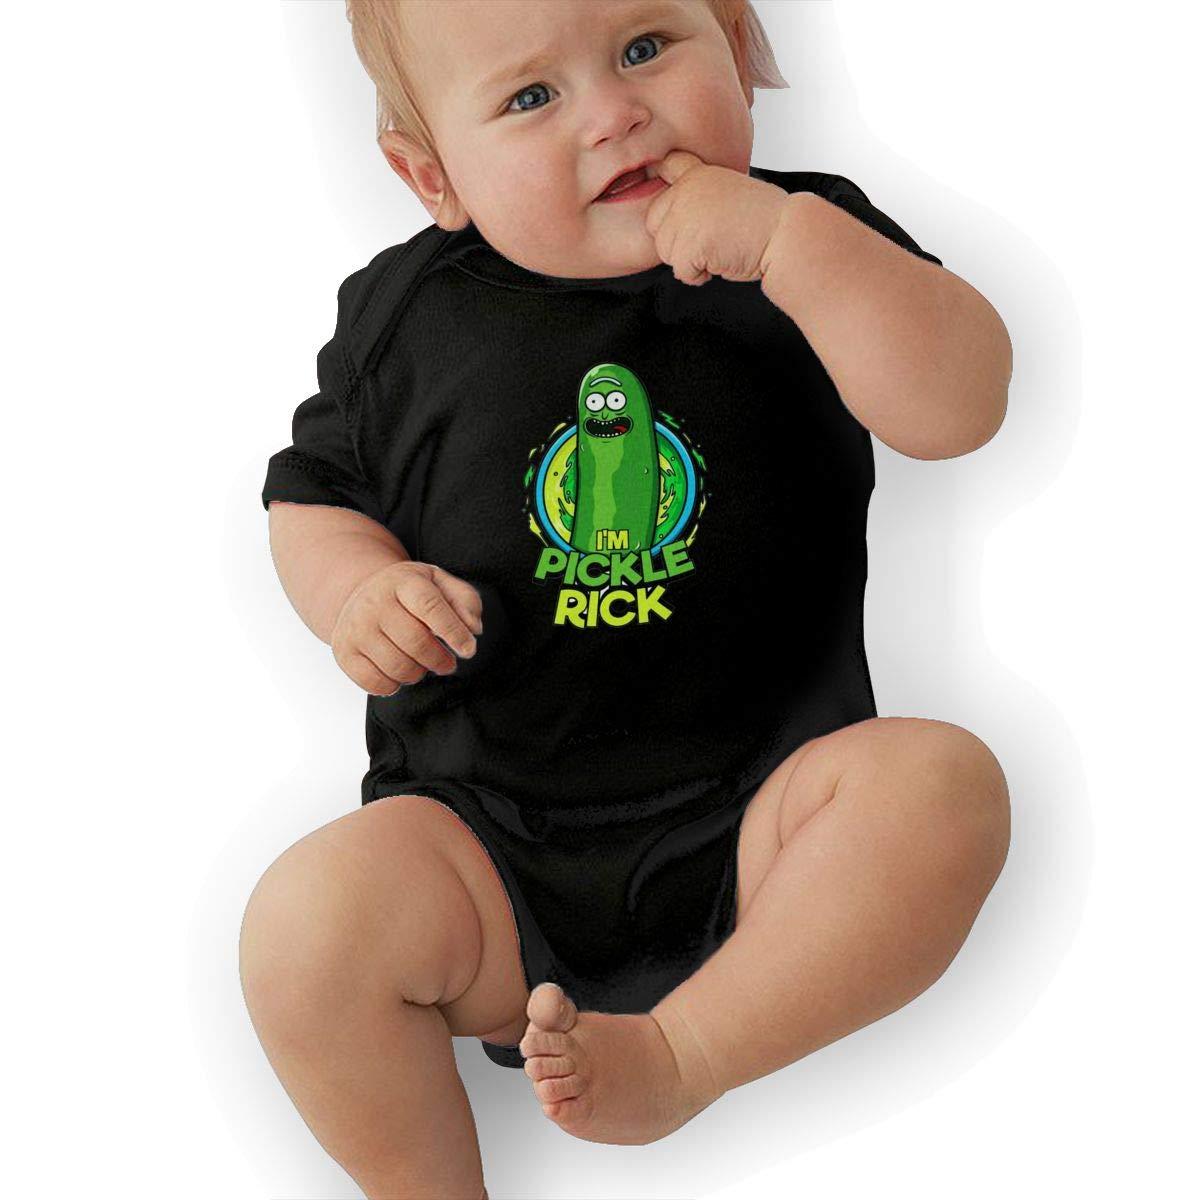 Dfenere Im Pickle Rick Fashion Newborn Baby Short Sleeve Bodysuit Romper Infant Summer Clothing